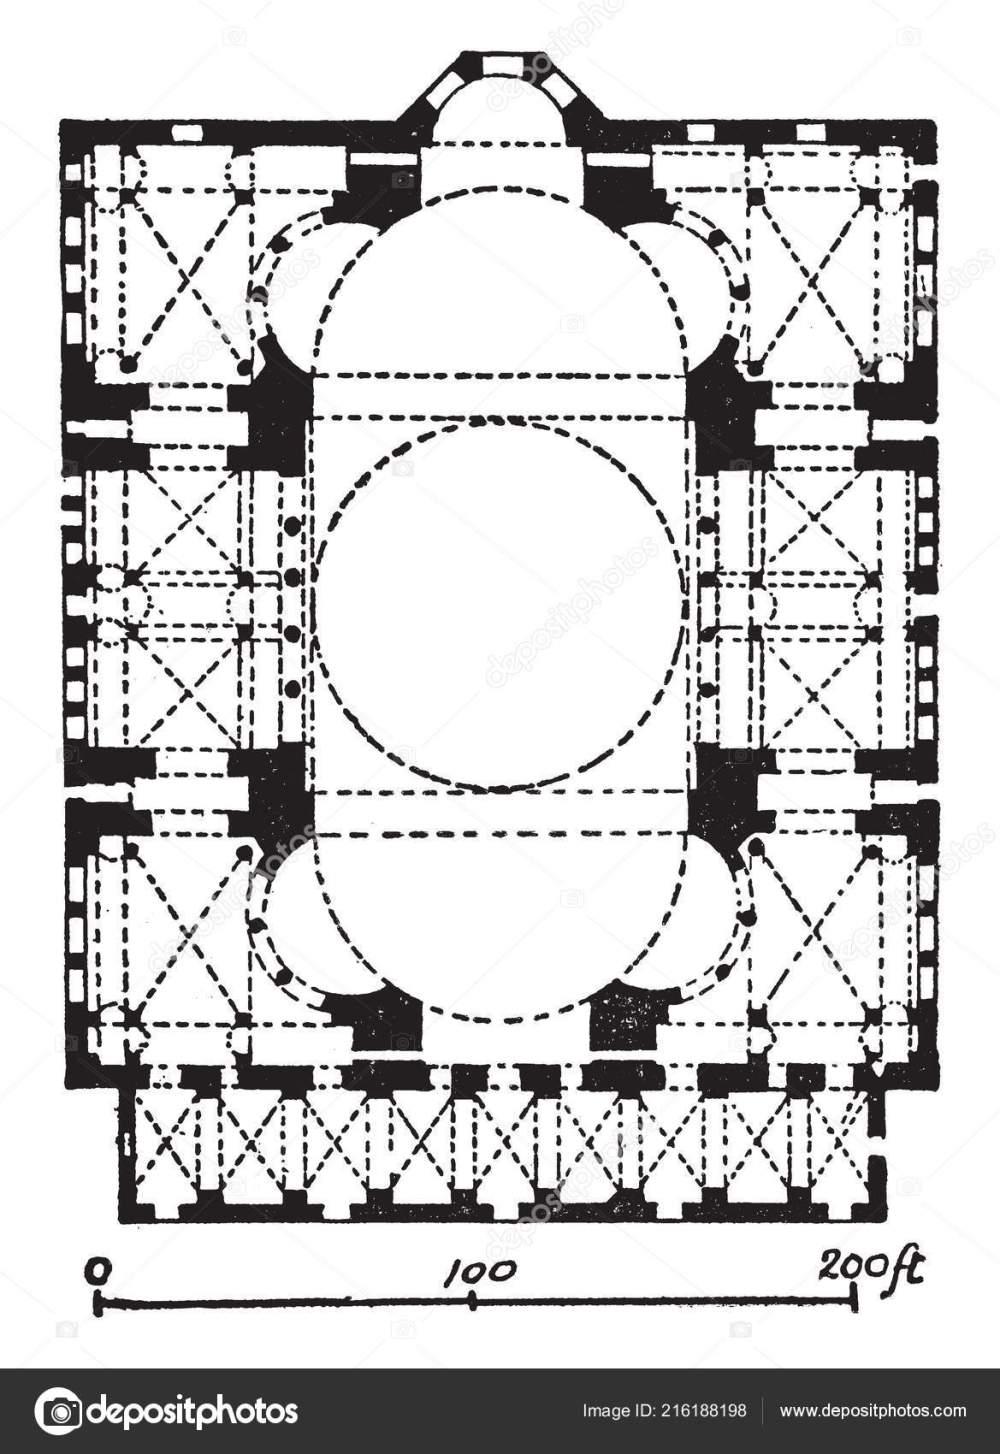 medium resolution of plan hagia sophia former patriarchal basilica later mosque massive dome stock vector